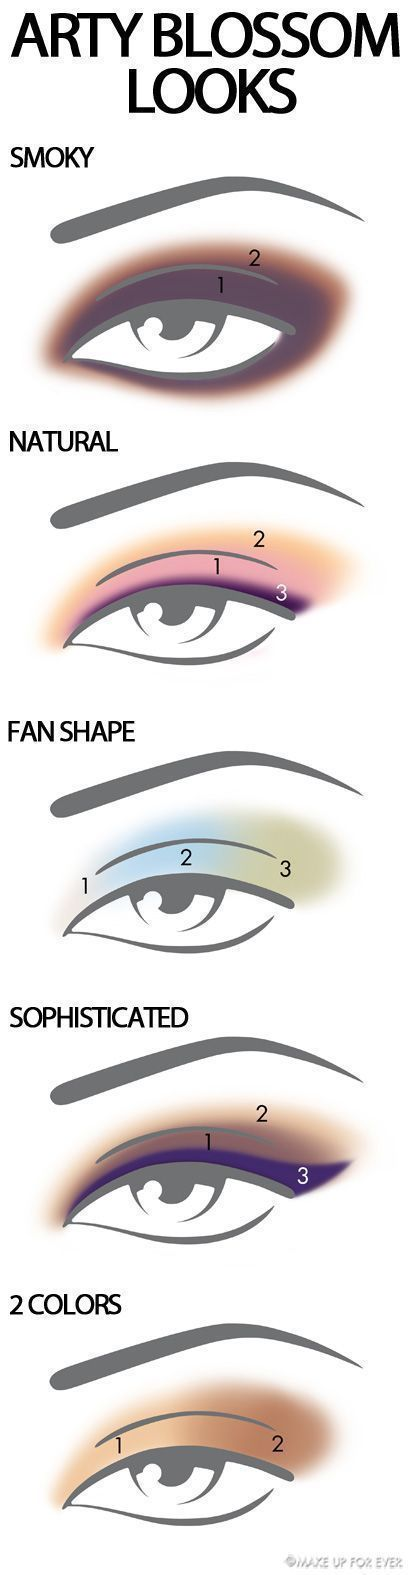 Different eye looks